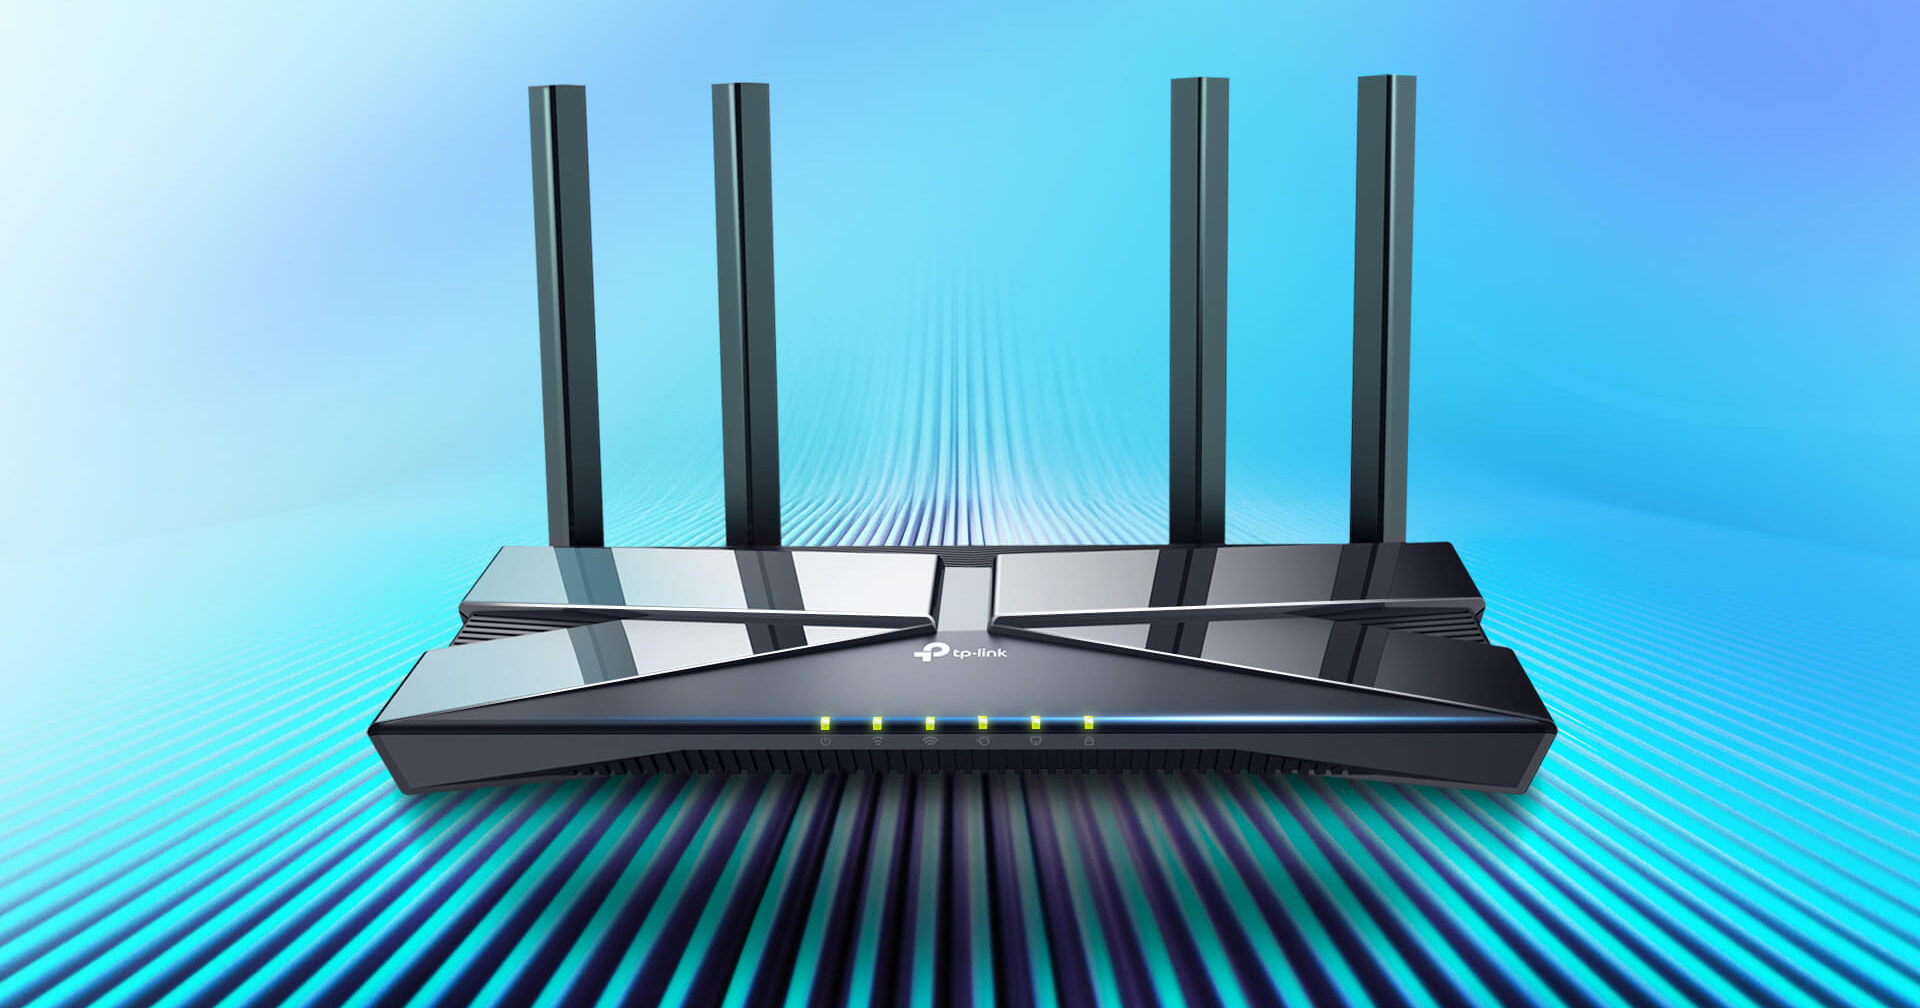 TP-Link apresenta Archer AX10, o router preparado para a casa do futuro